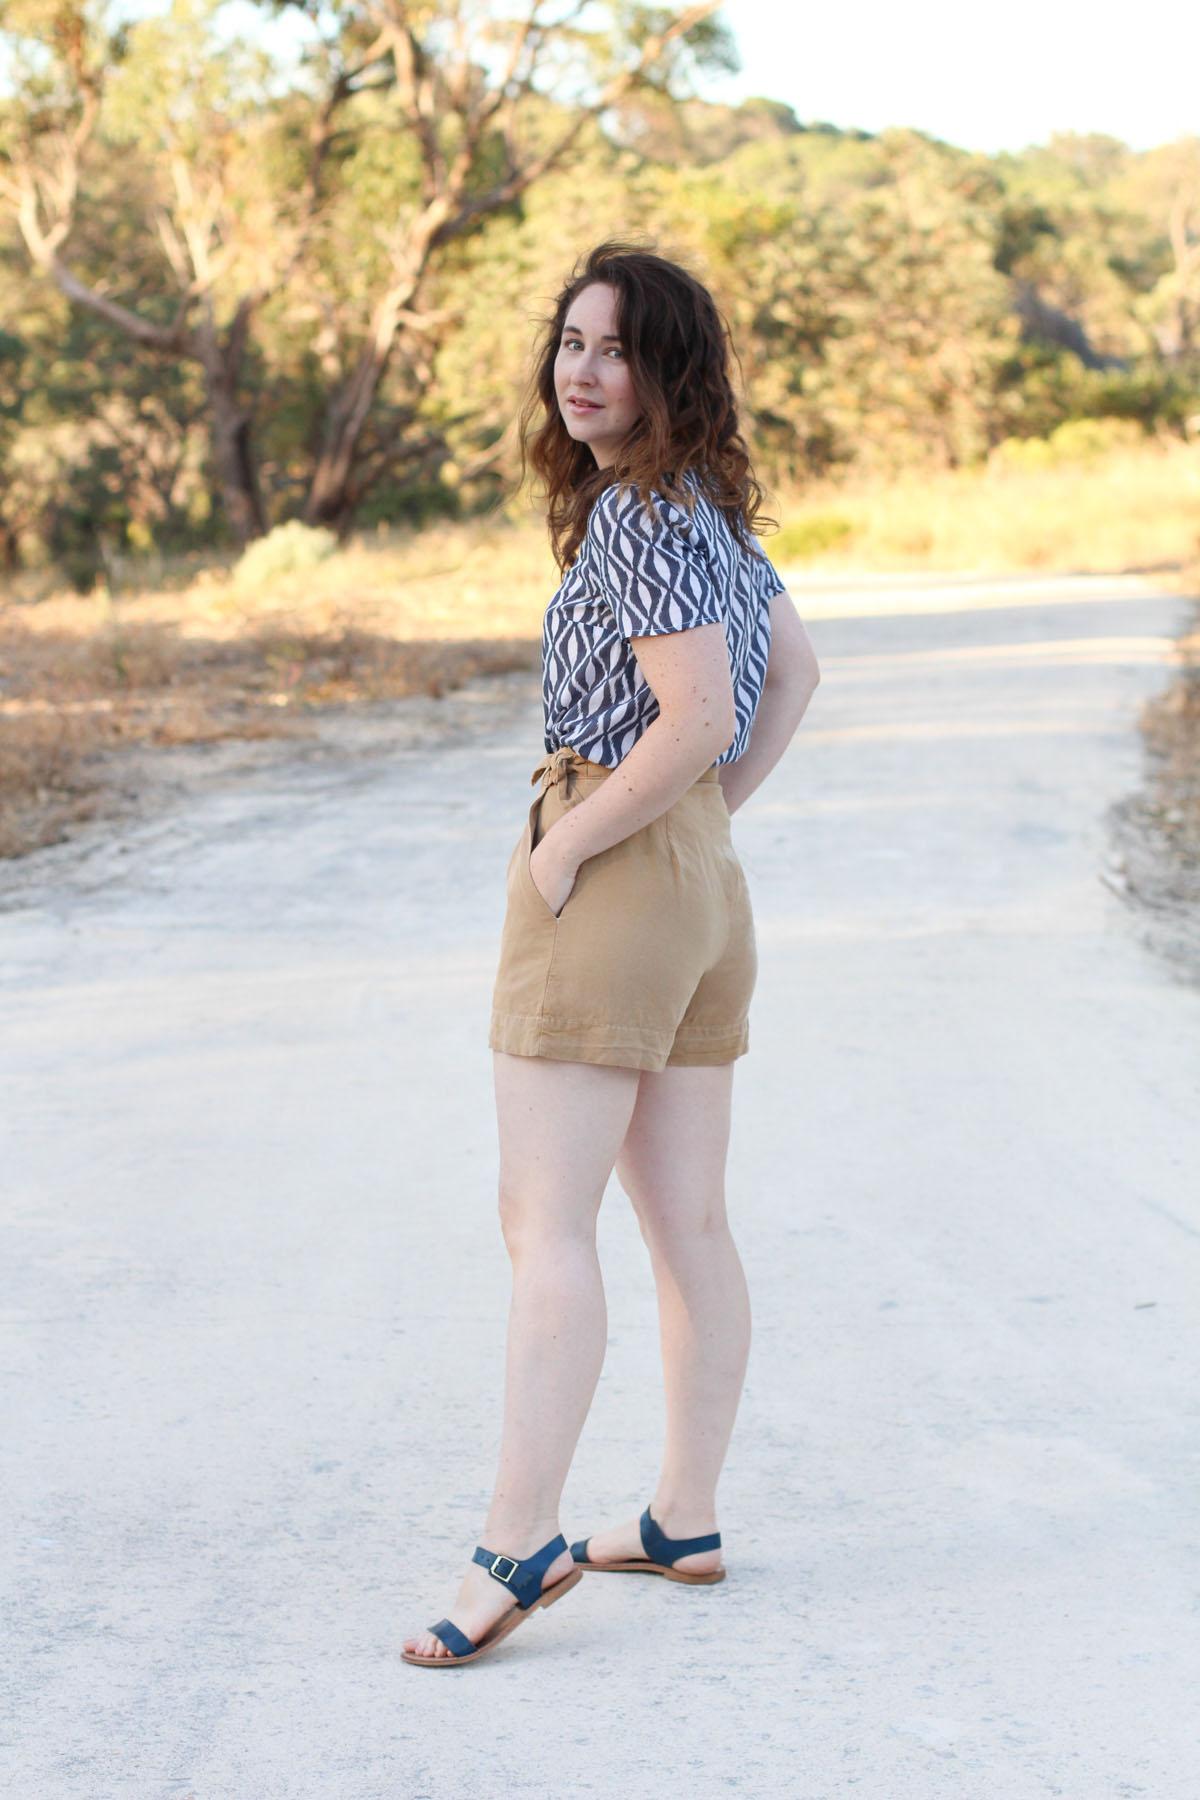 Megan Nielsen Flint shorts + Banksia blouse